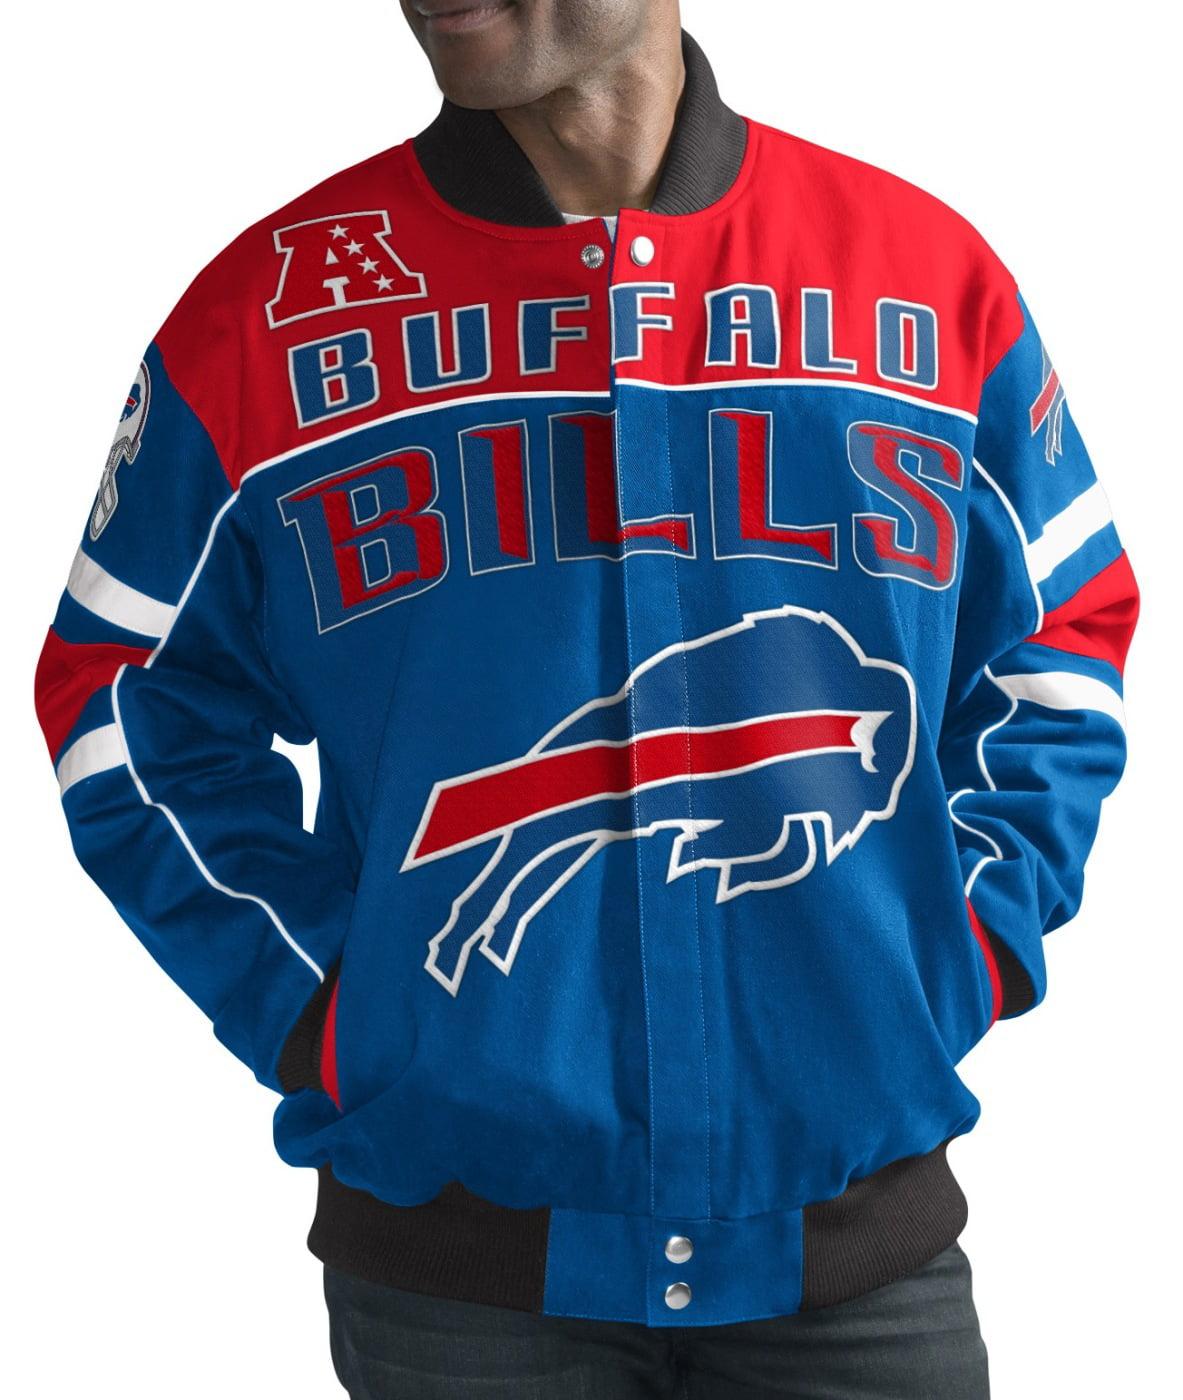 "Buffalo Bills Men's NFL G-III ""Blitz"" Premium Cotton Twill Jacket by G-III Sports"